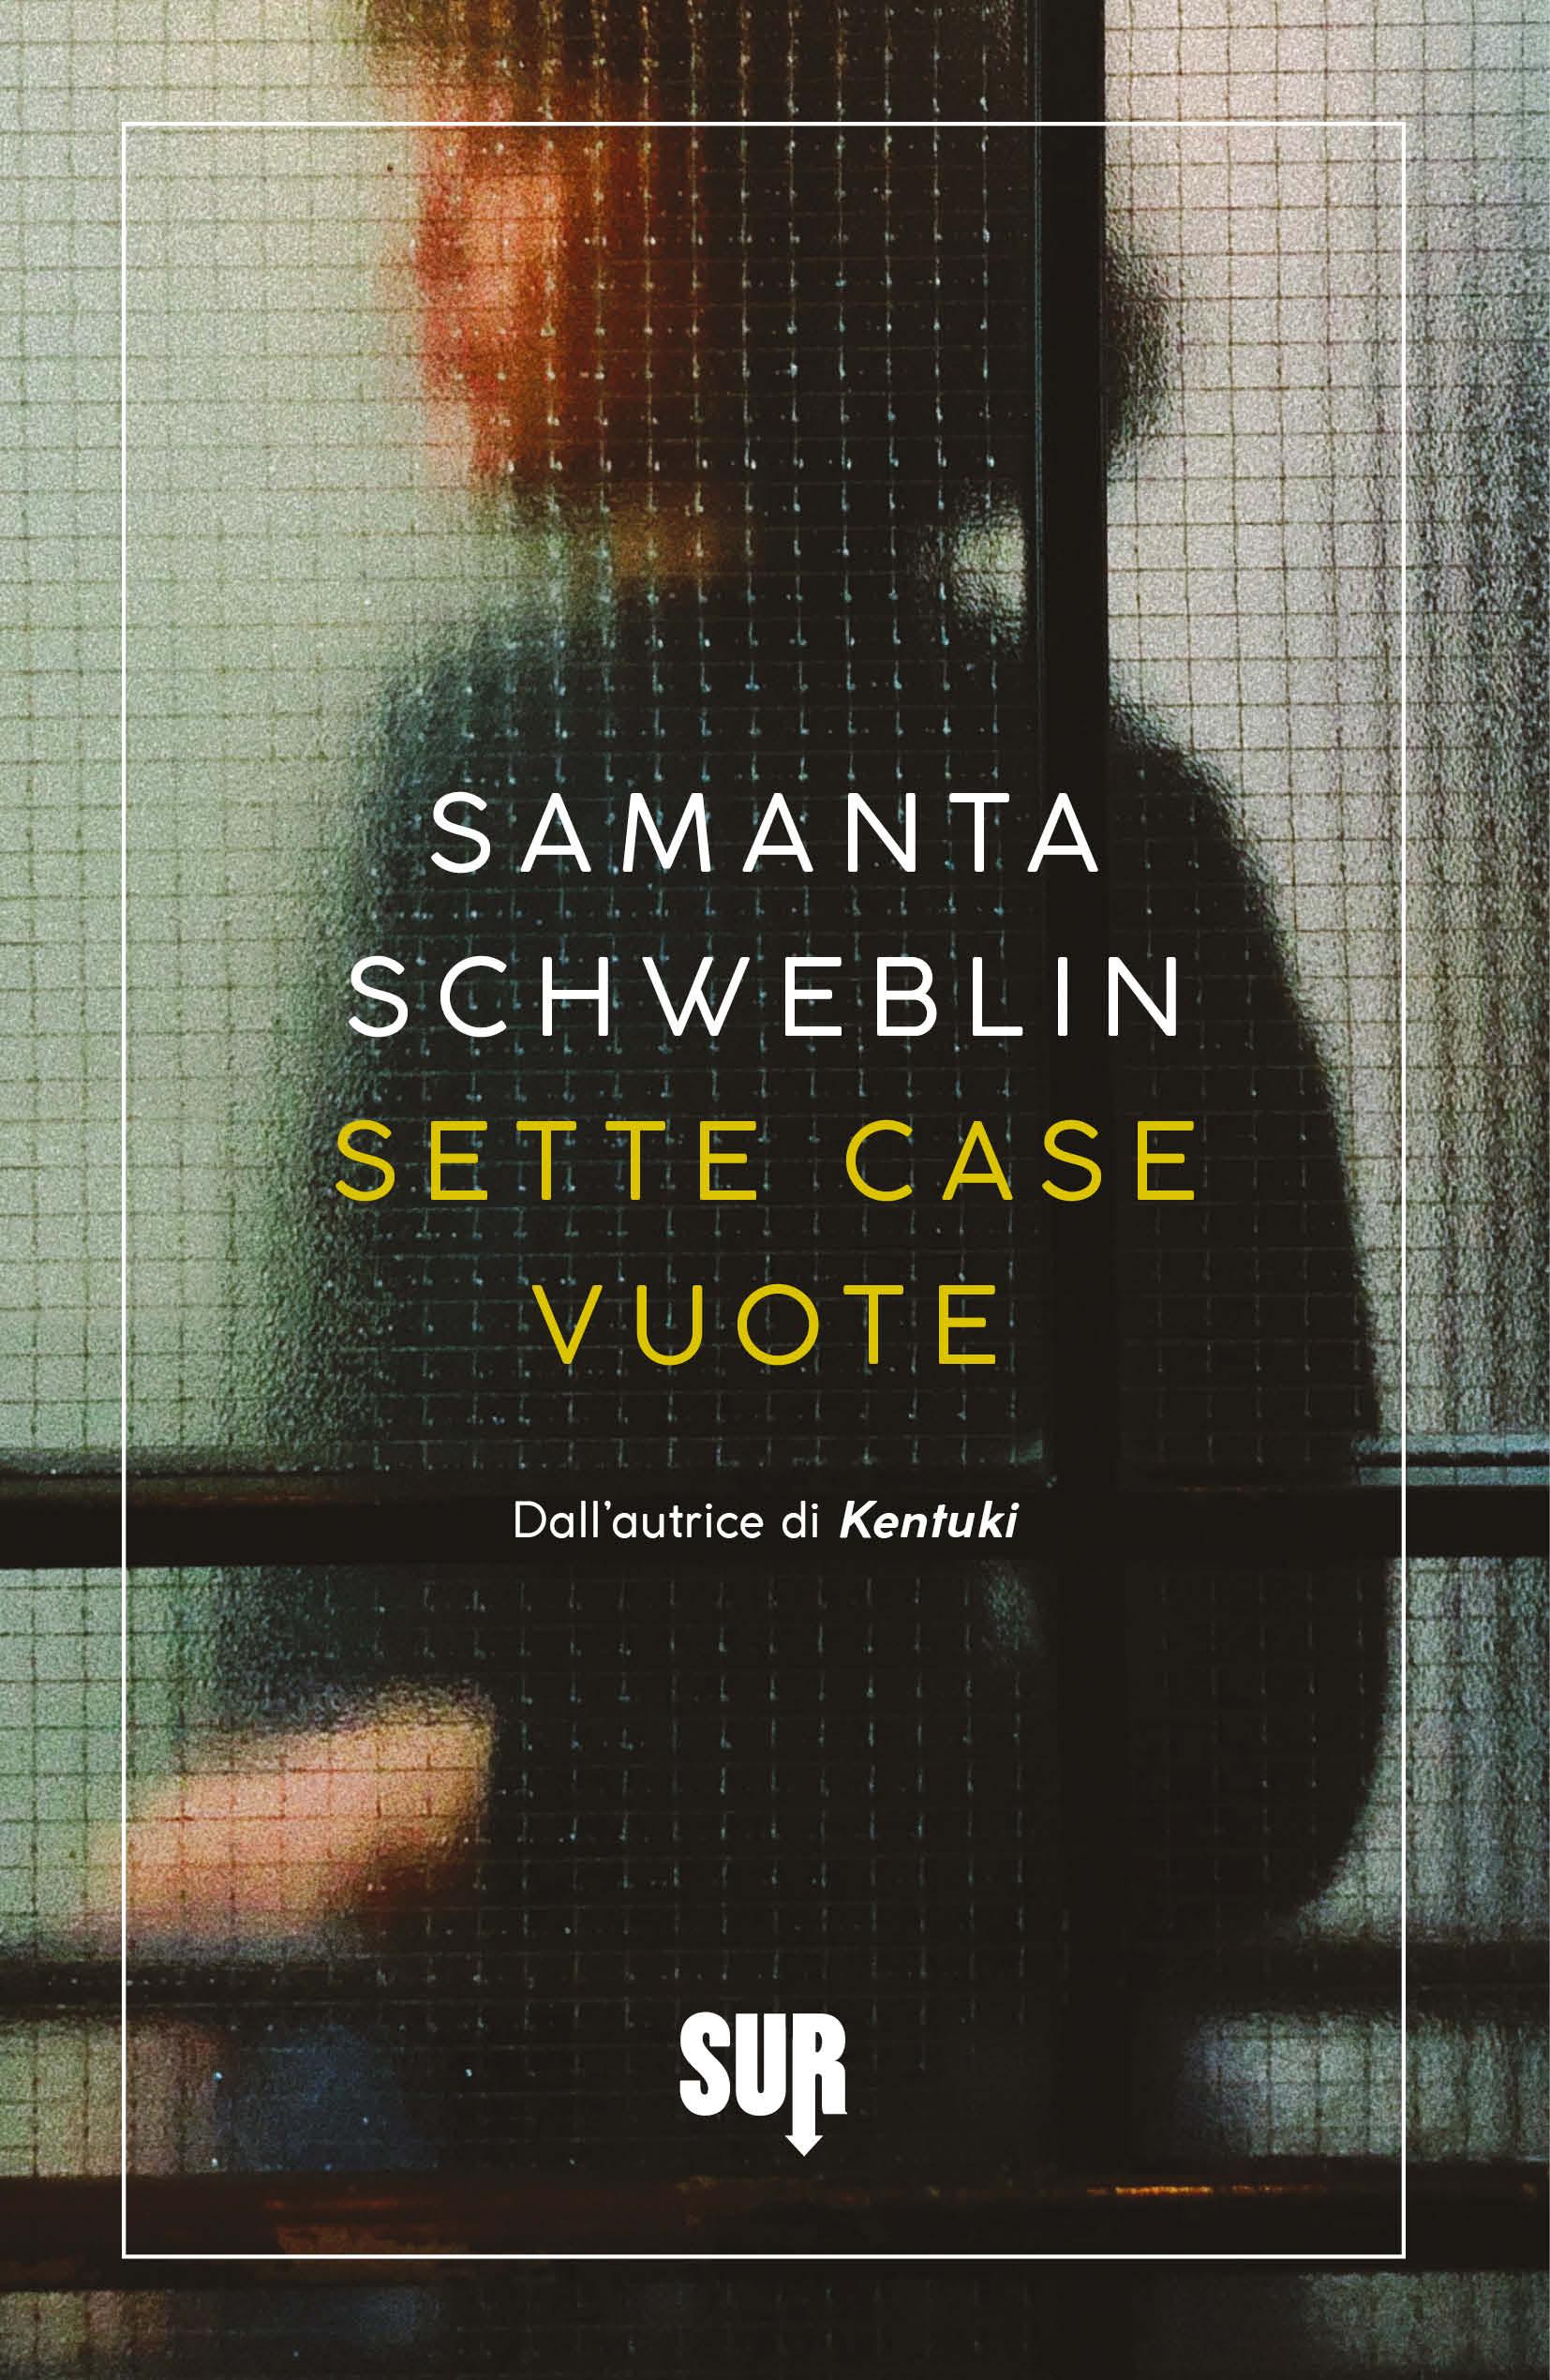 Samantha Schweblin, Sette case vuote